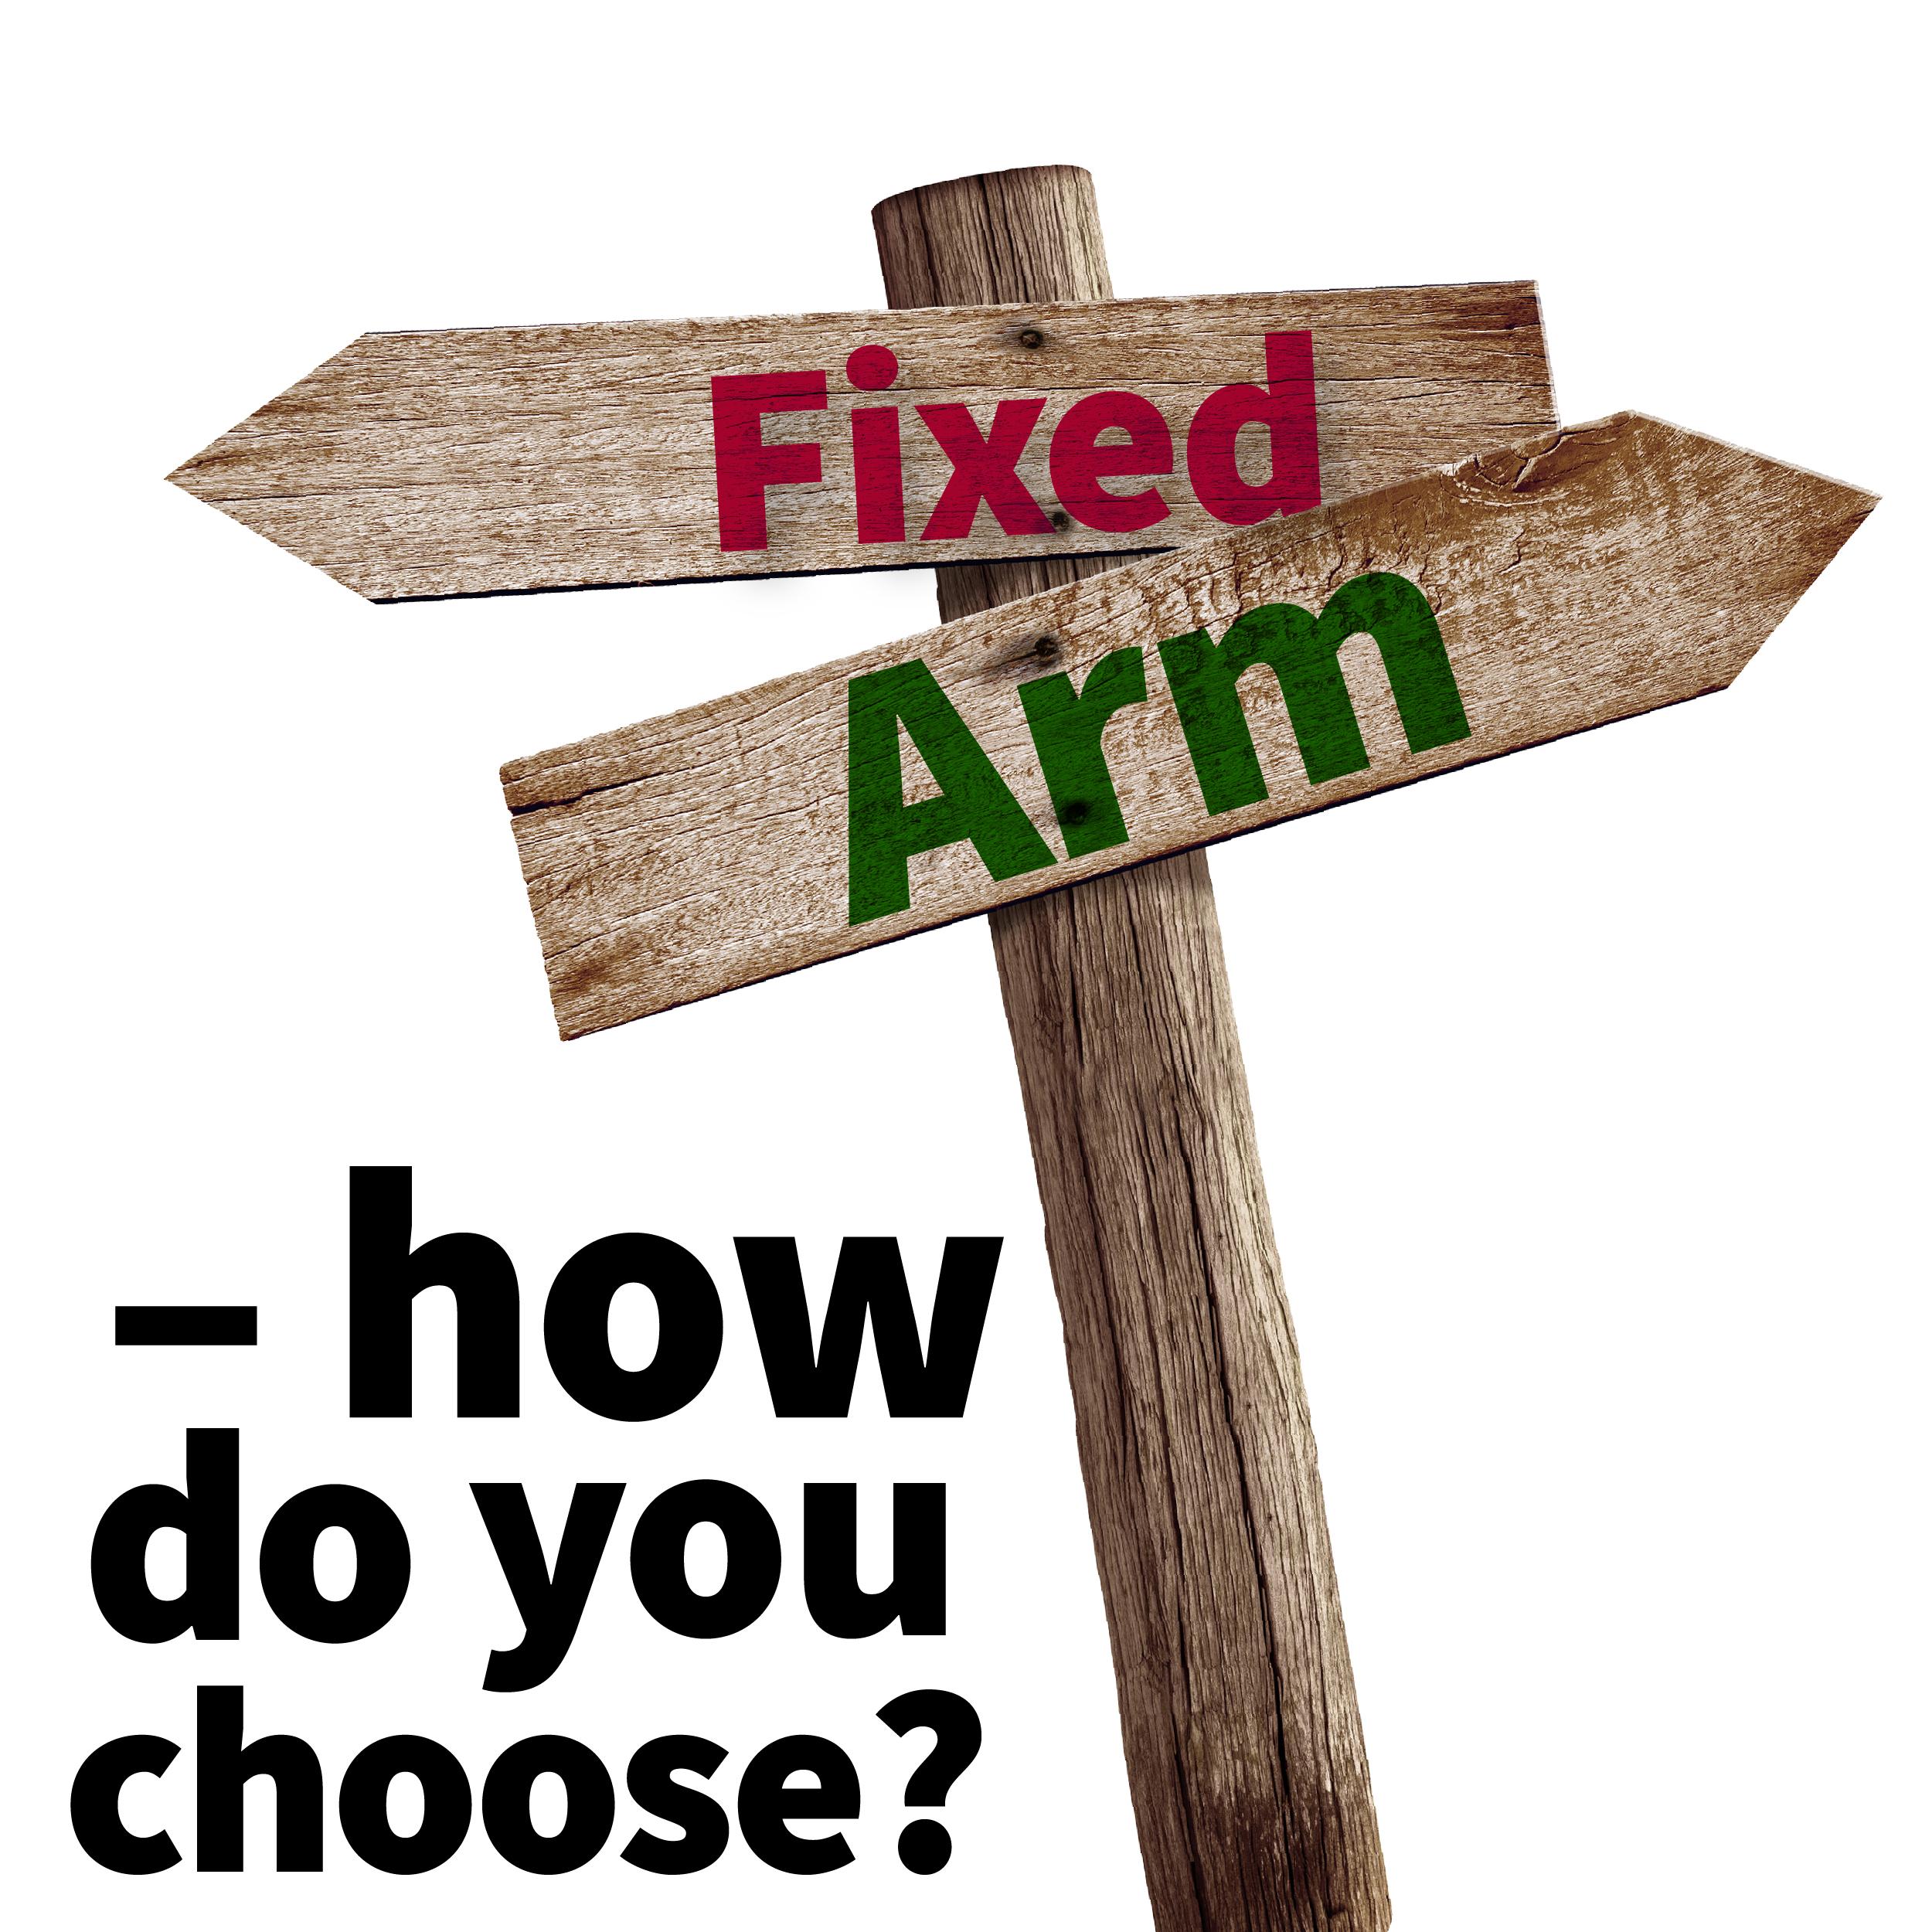 Fixed_vs._Arm_redux-01